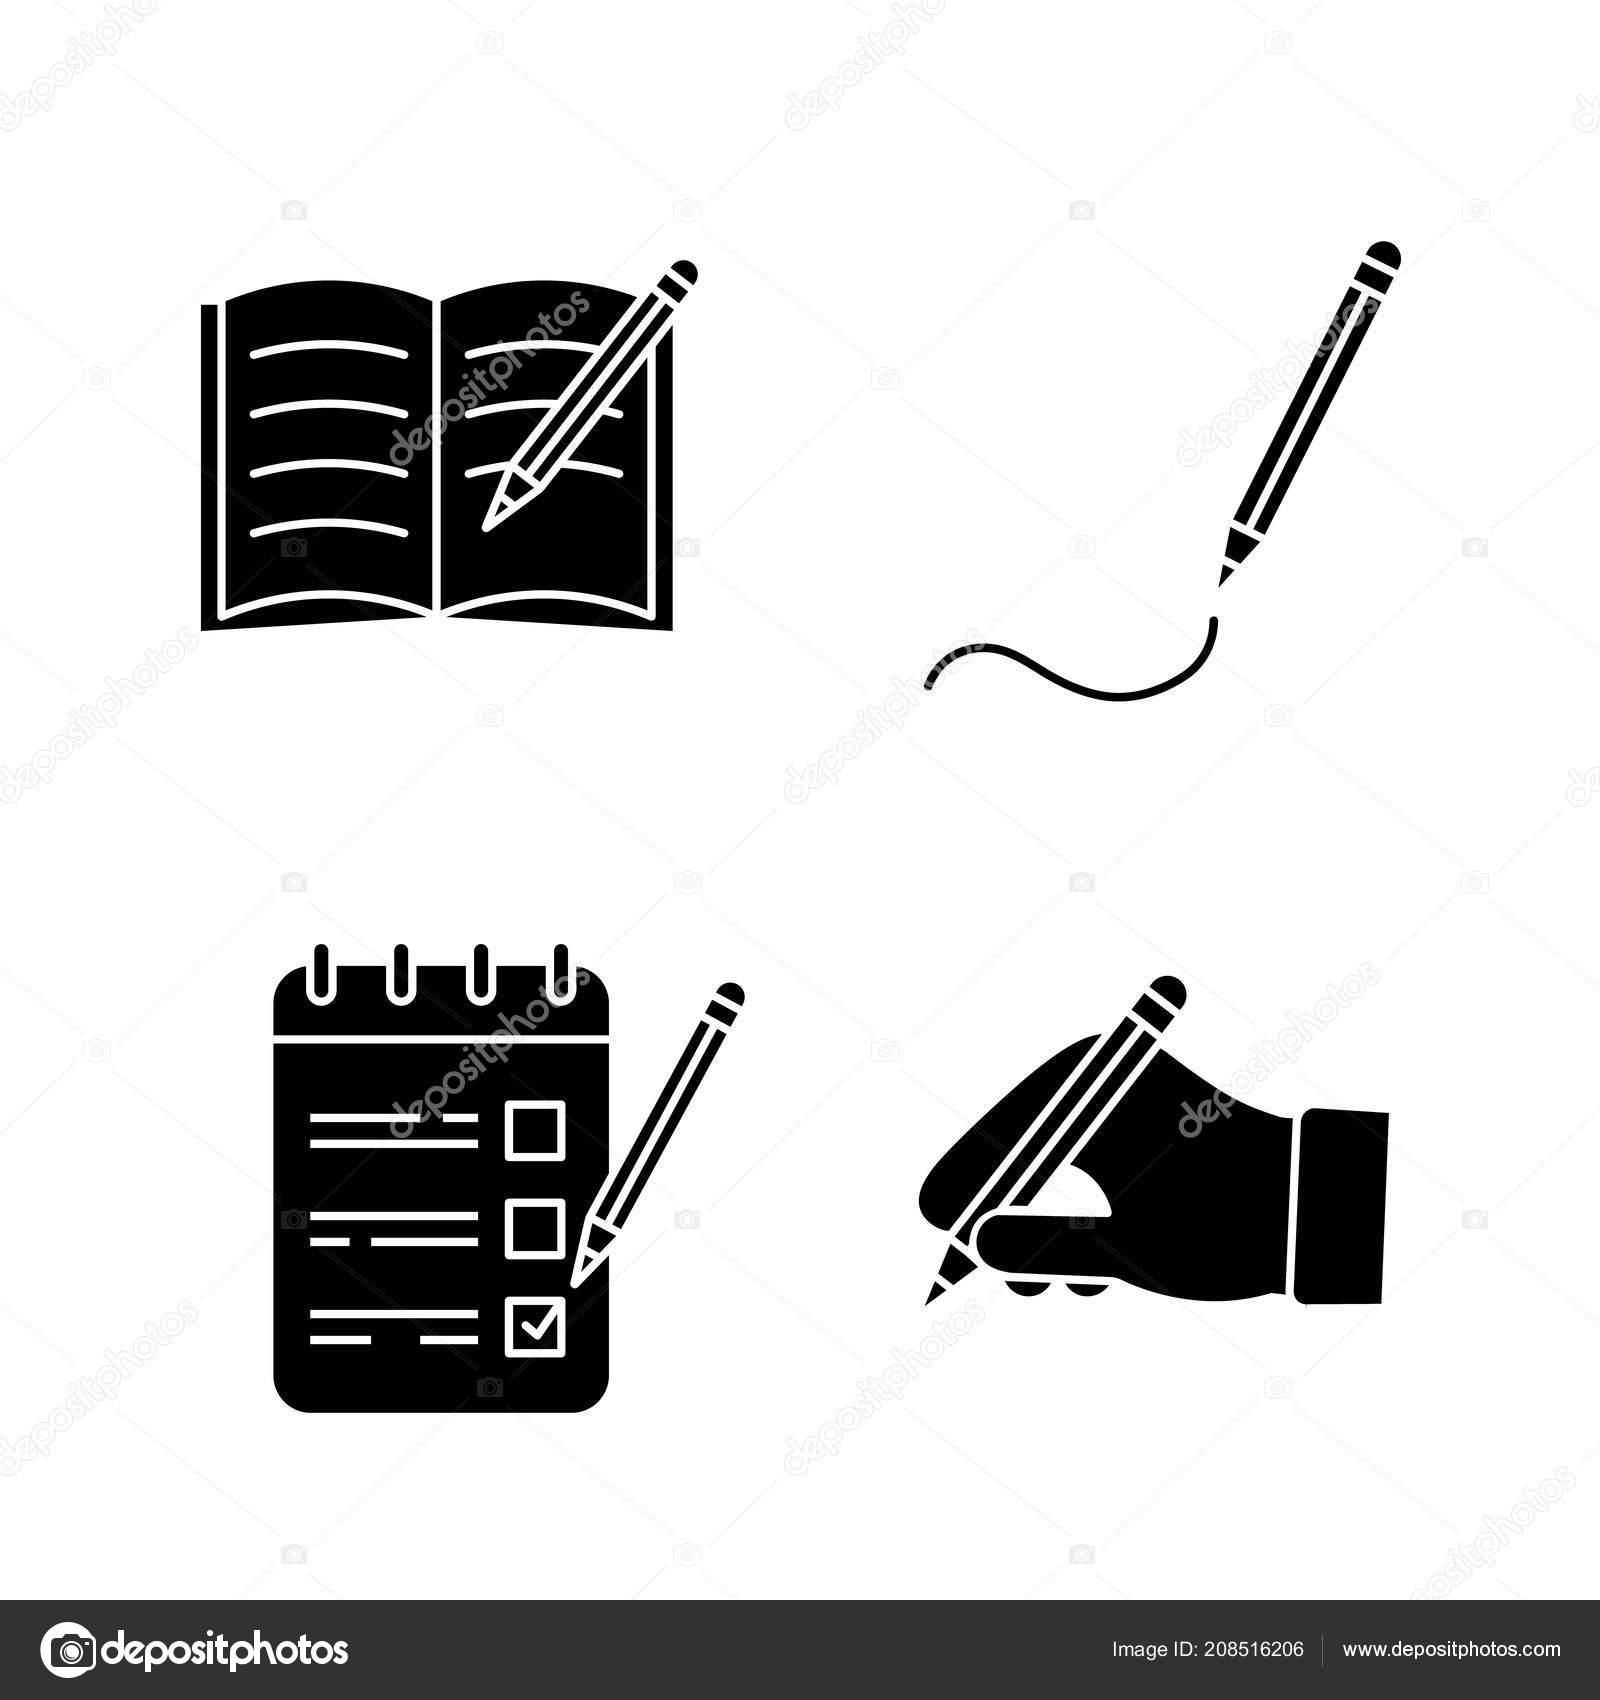 Psani Sady Ikony Glyfu Tuzka Kopirovani Knihy Kresba Seznam Ukolu